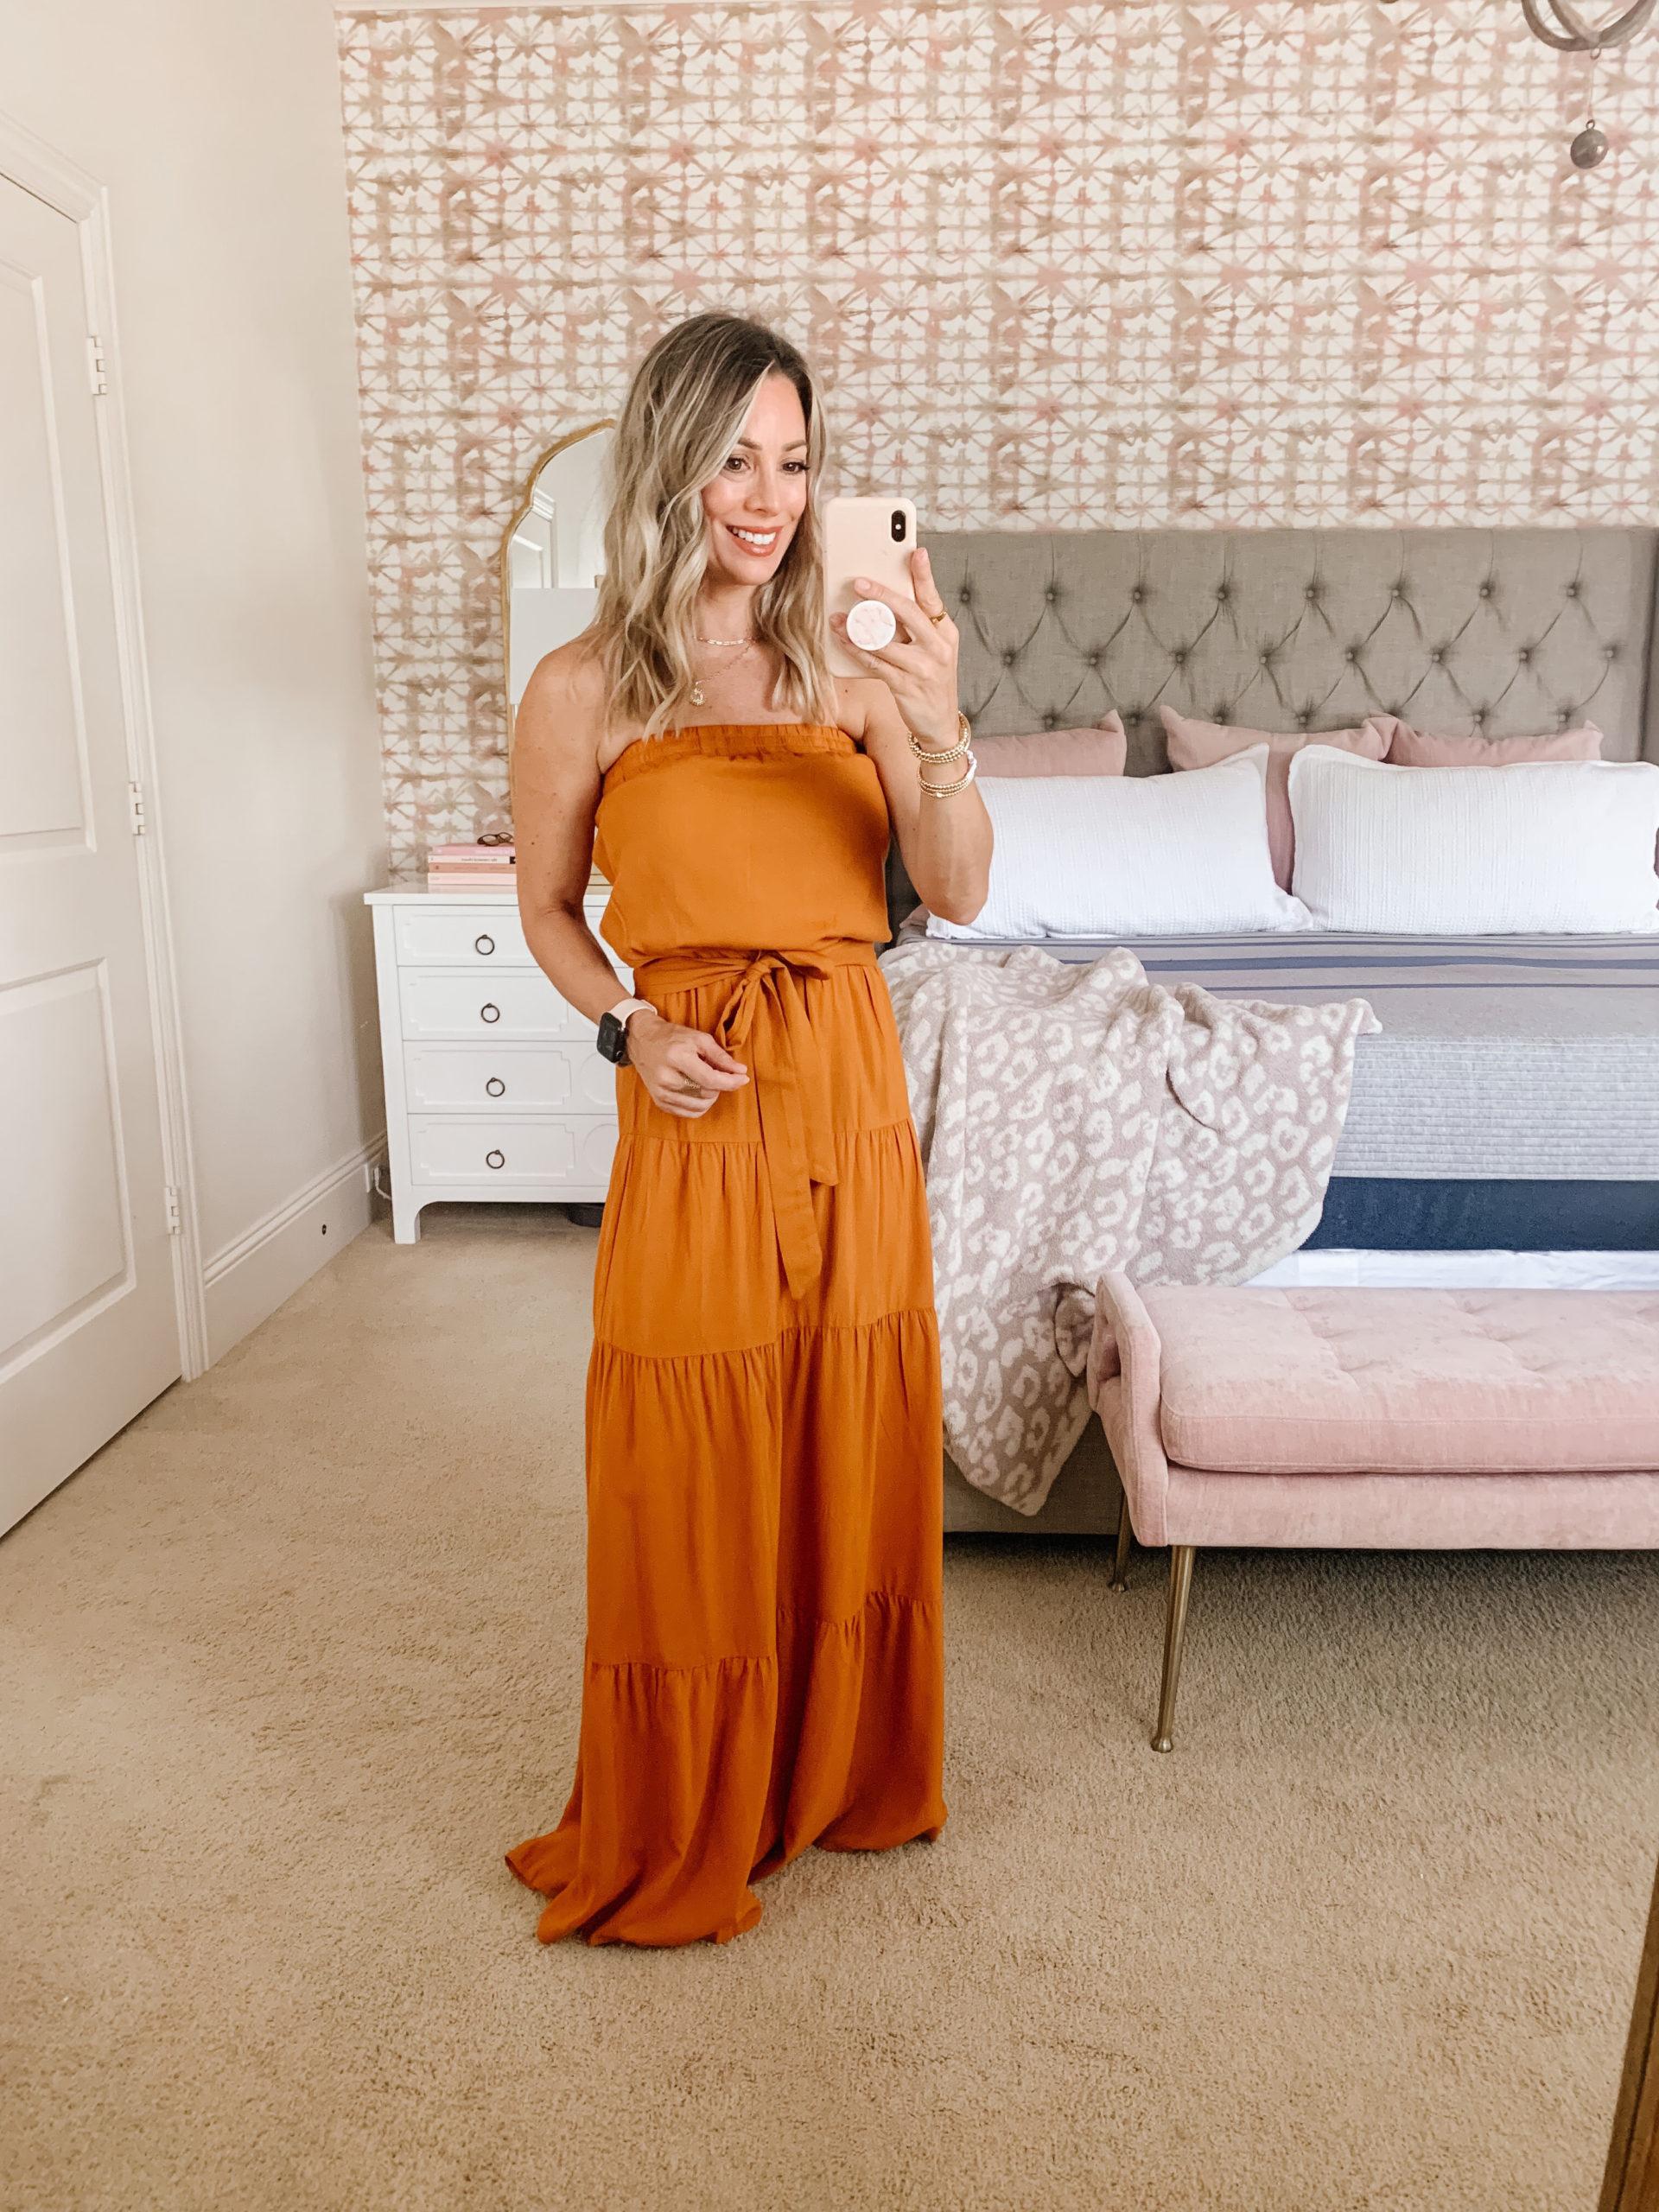 Amazon Fashion, Strapless Dress